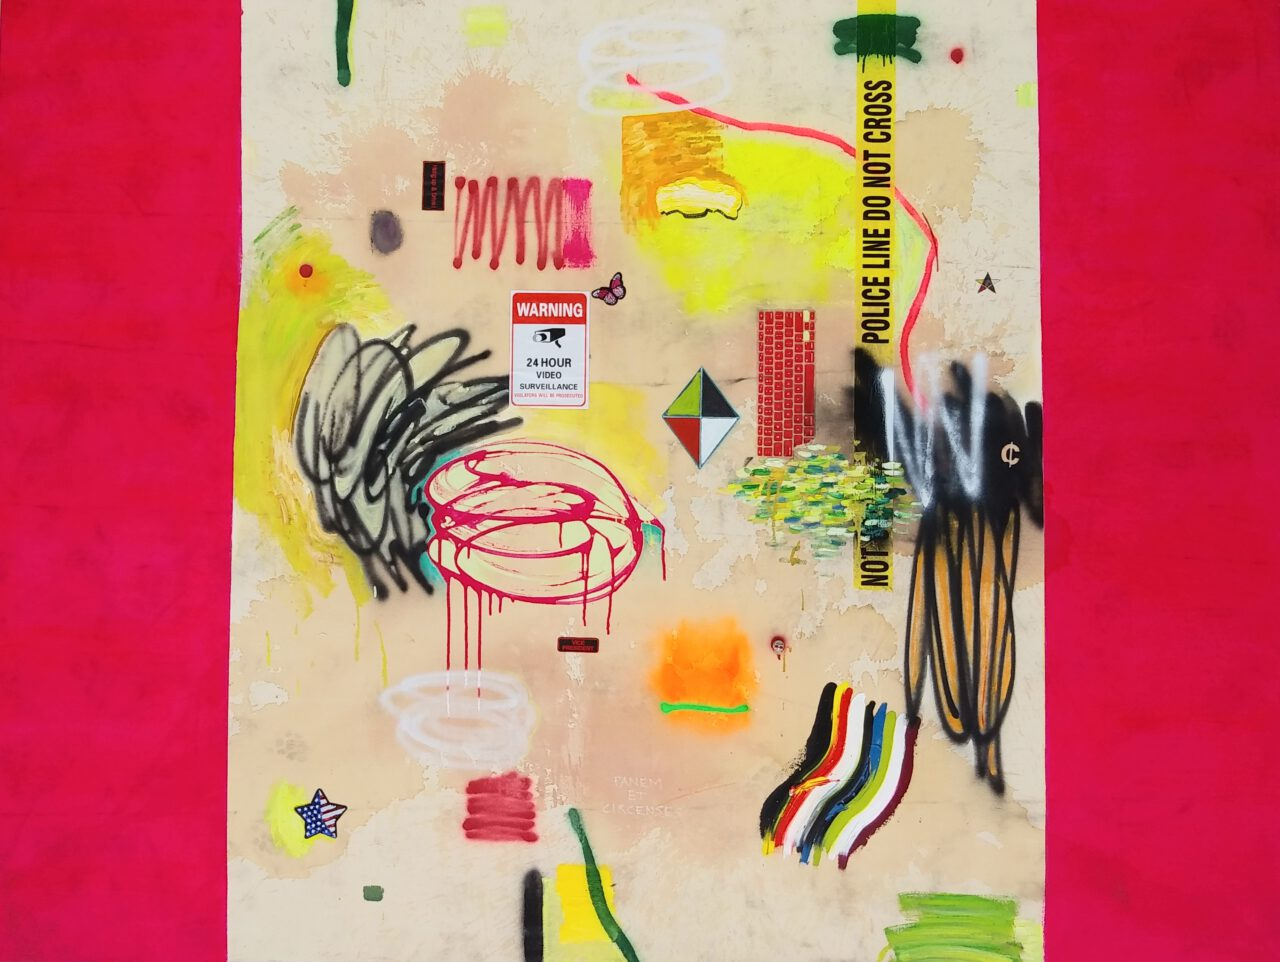 Empire series - MiT#132 (Panem et Circenses - magenta). 2020. oil, acrylic, spray paint, tea, coffee, wine, motor oil, rubber, marker pen, patch, sticker, leather glove, denim, plastic tape, metal ornament skull, security camera on canvas. 72 x 96 inches